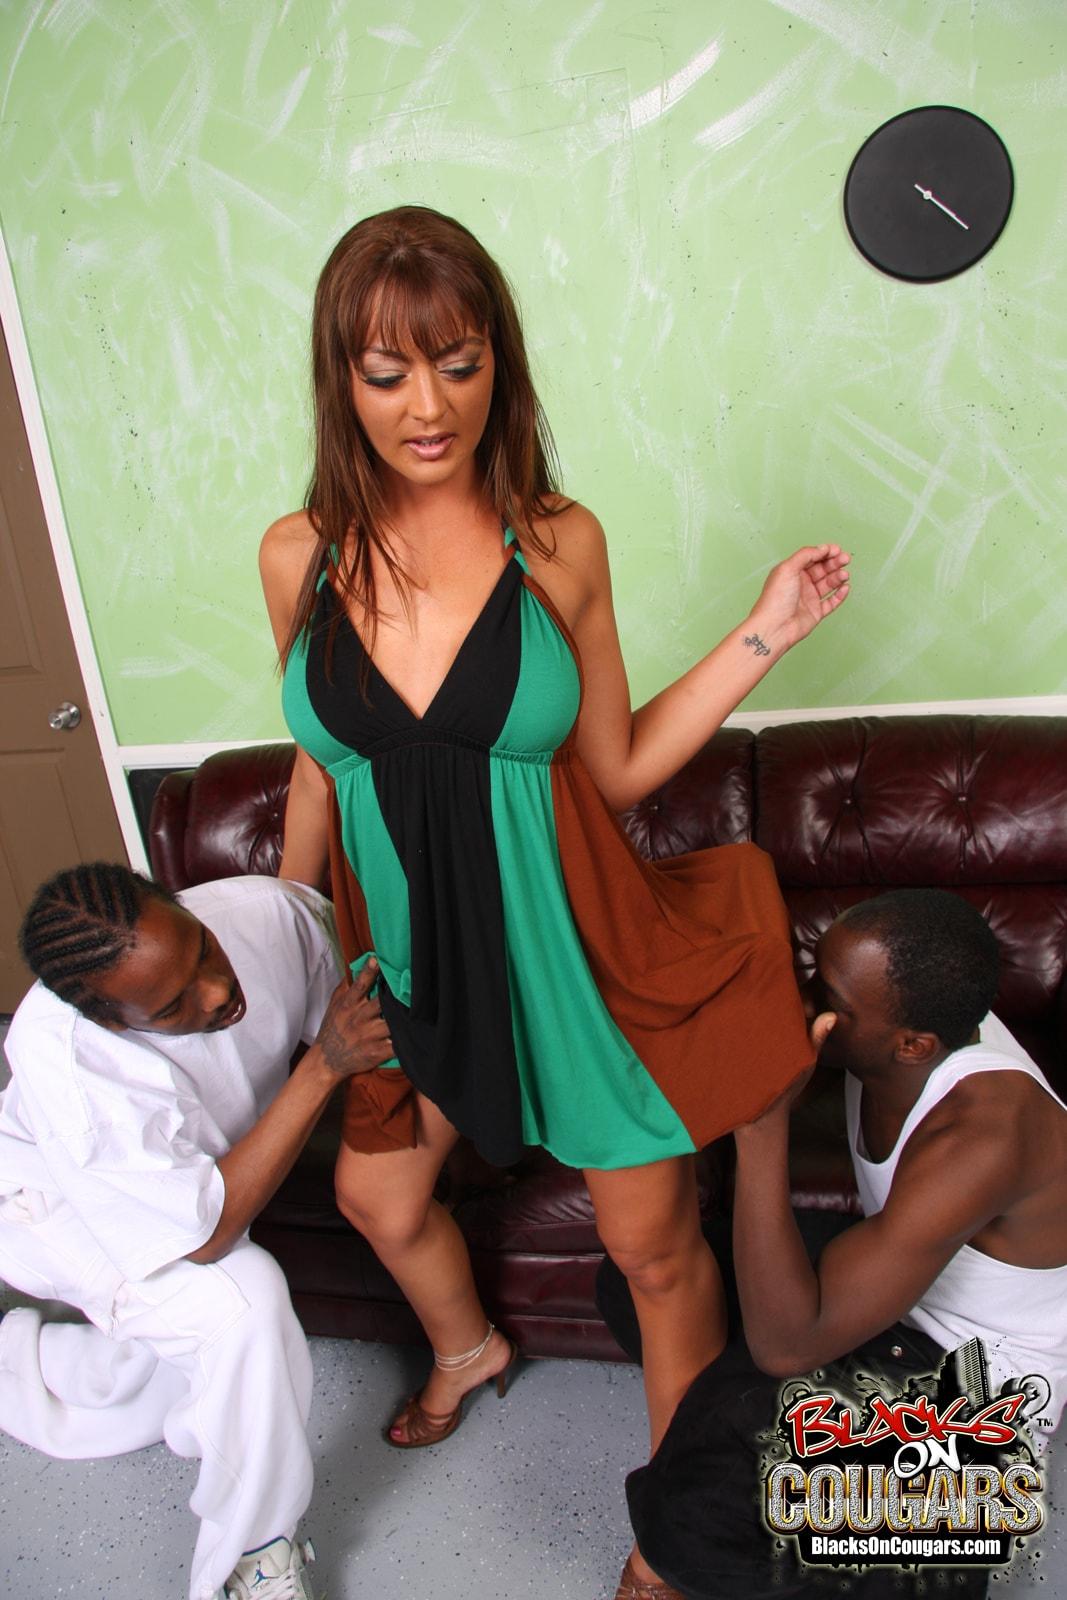 Dogfart '- Blacks On Cougars' starring Michaela Mancini (Photo 7)